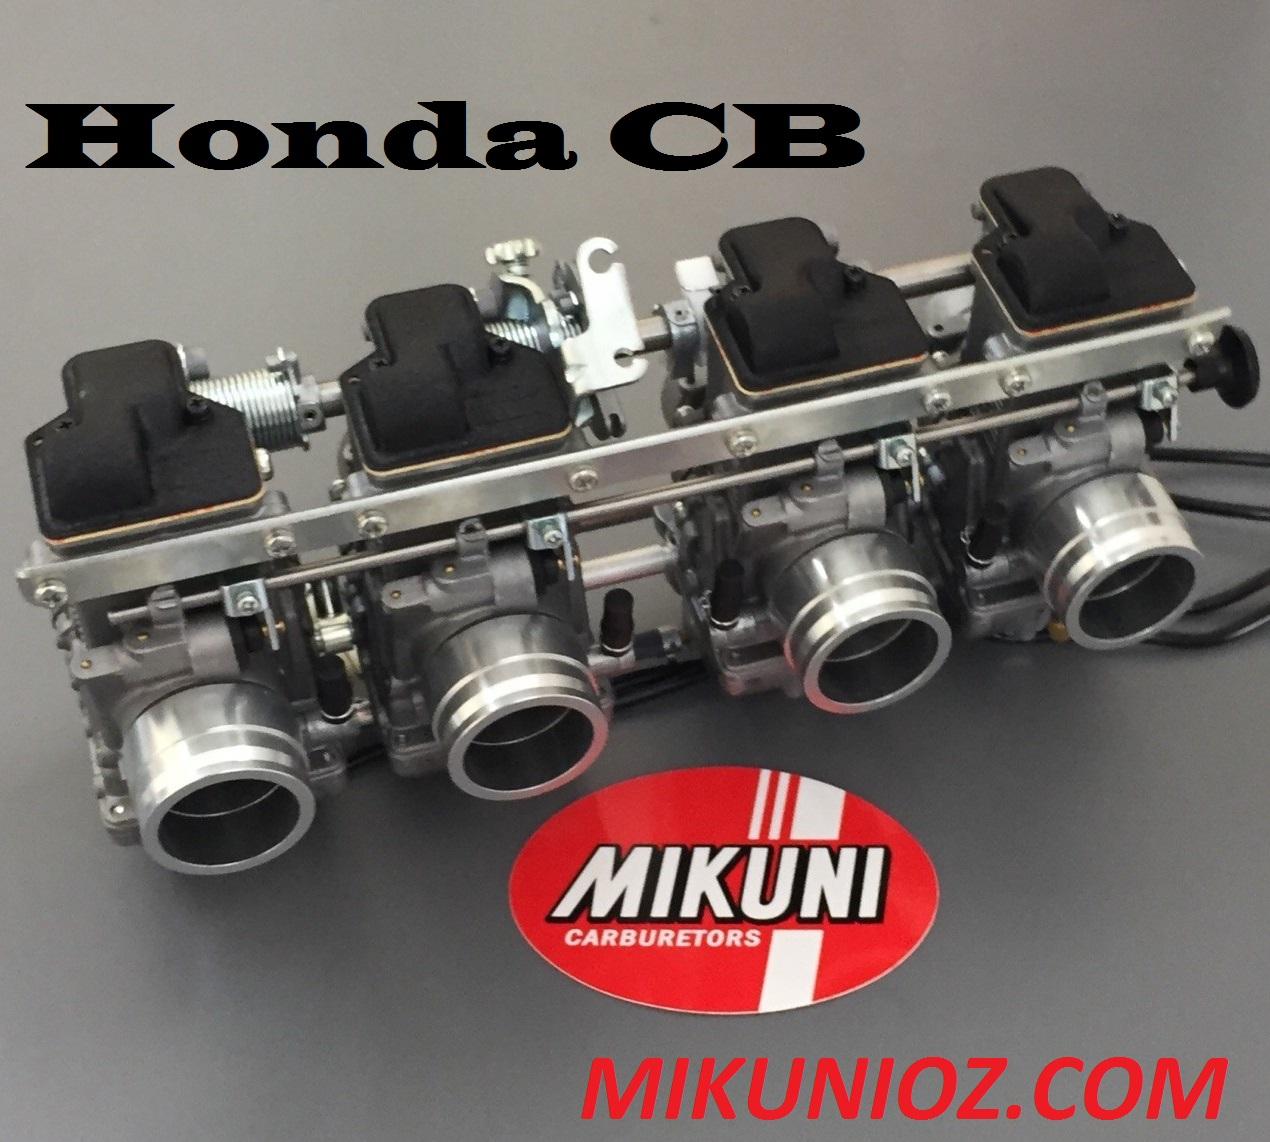 Mikuni RS 36mm Carb Kit- Honda DOHC CB1100, Honda CB900, Honda CB750